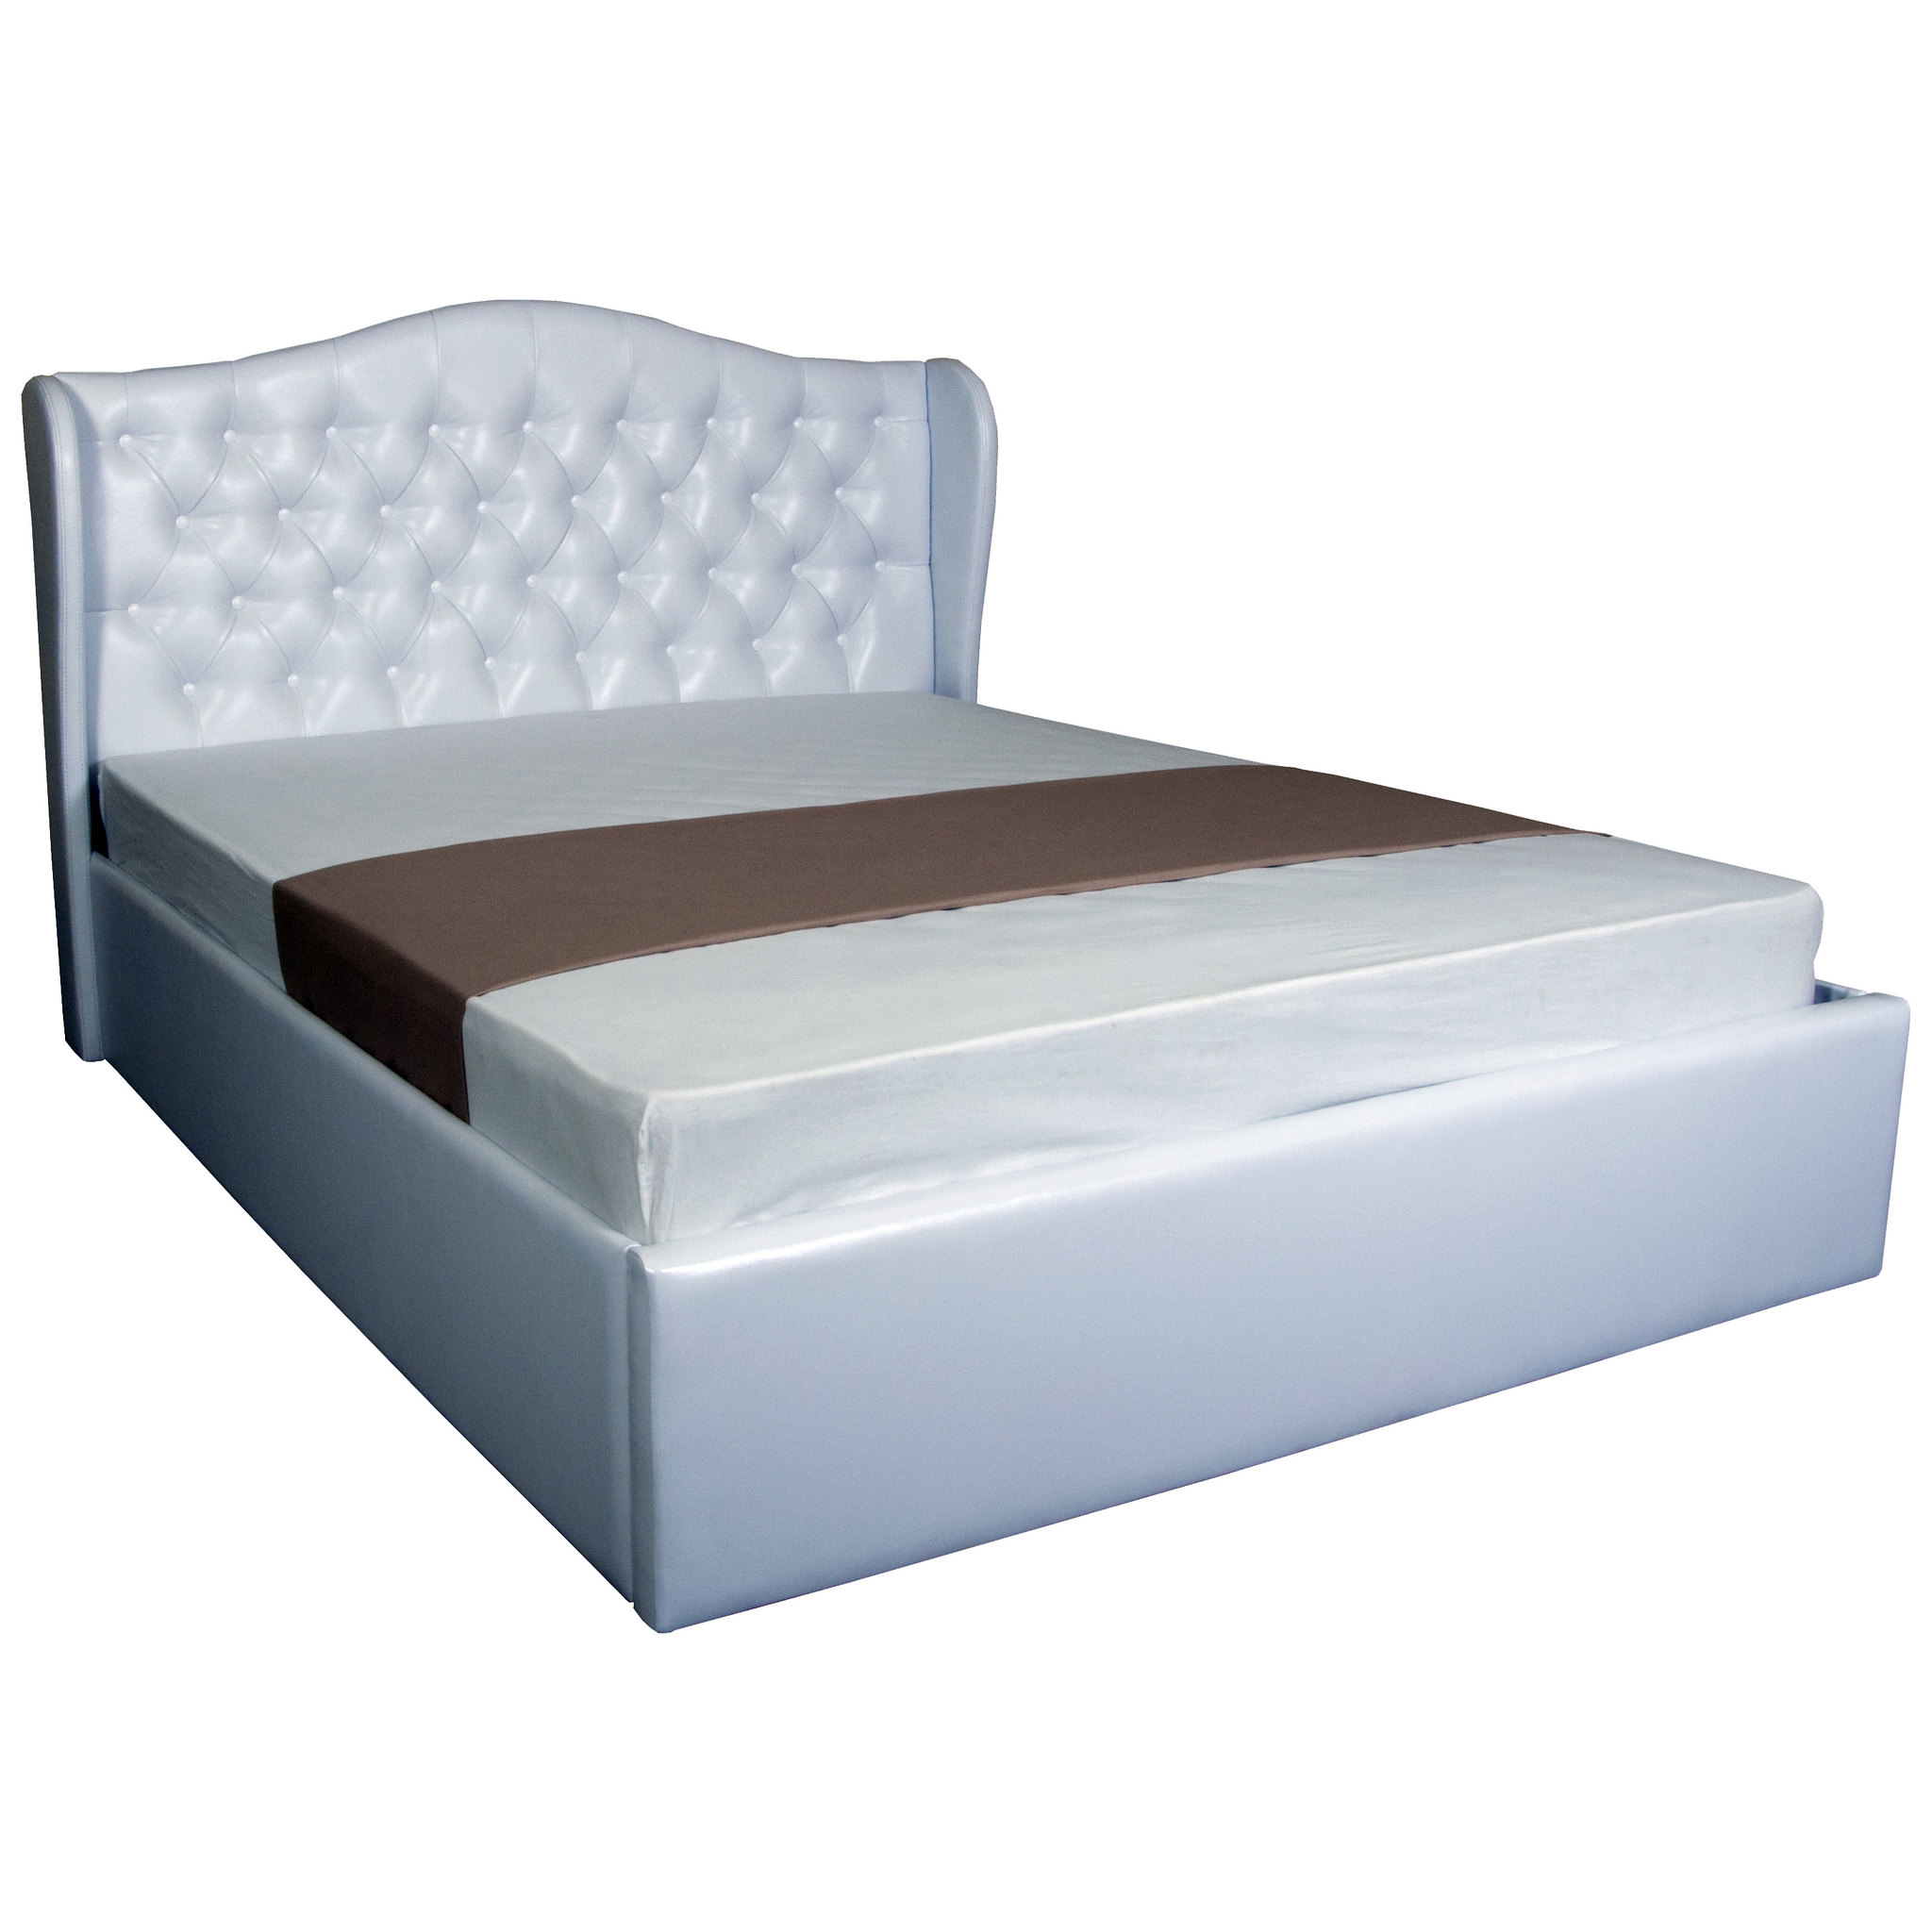 Кровати недорого купить в магазине онлайн